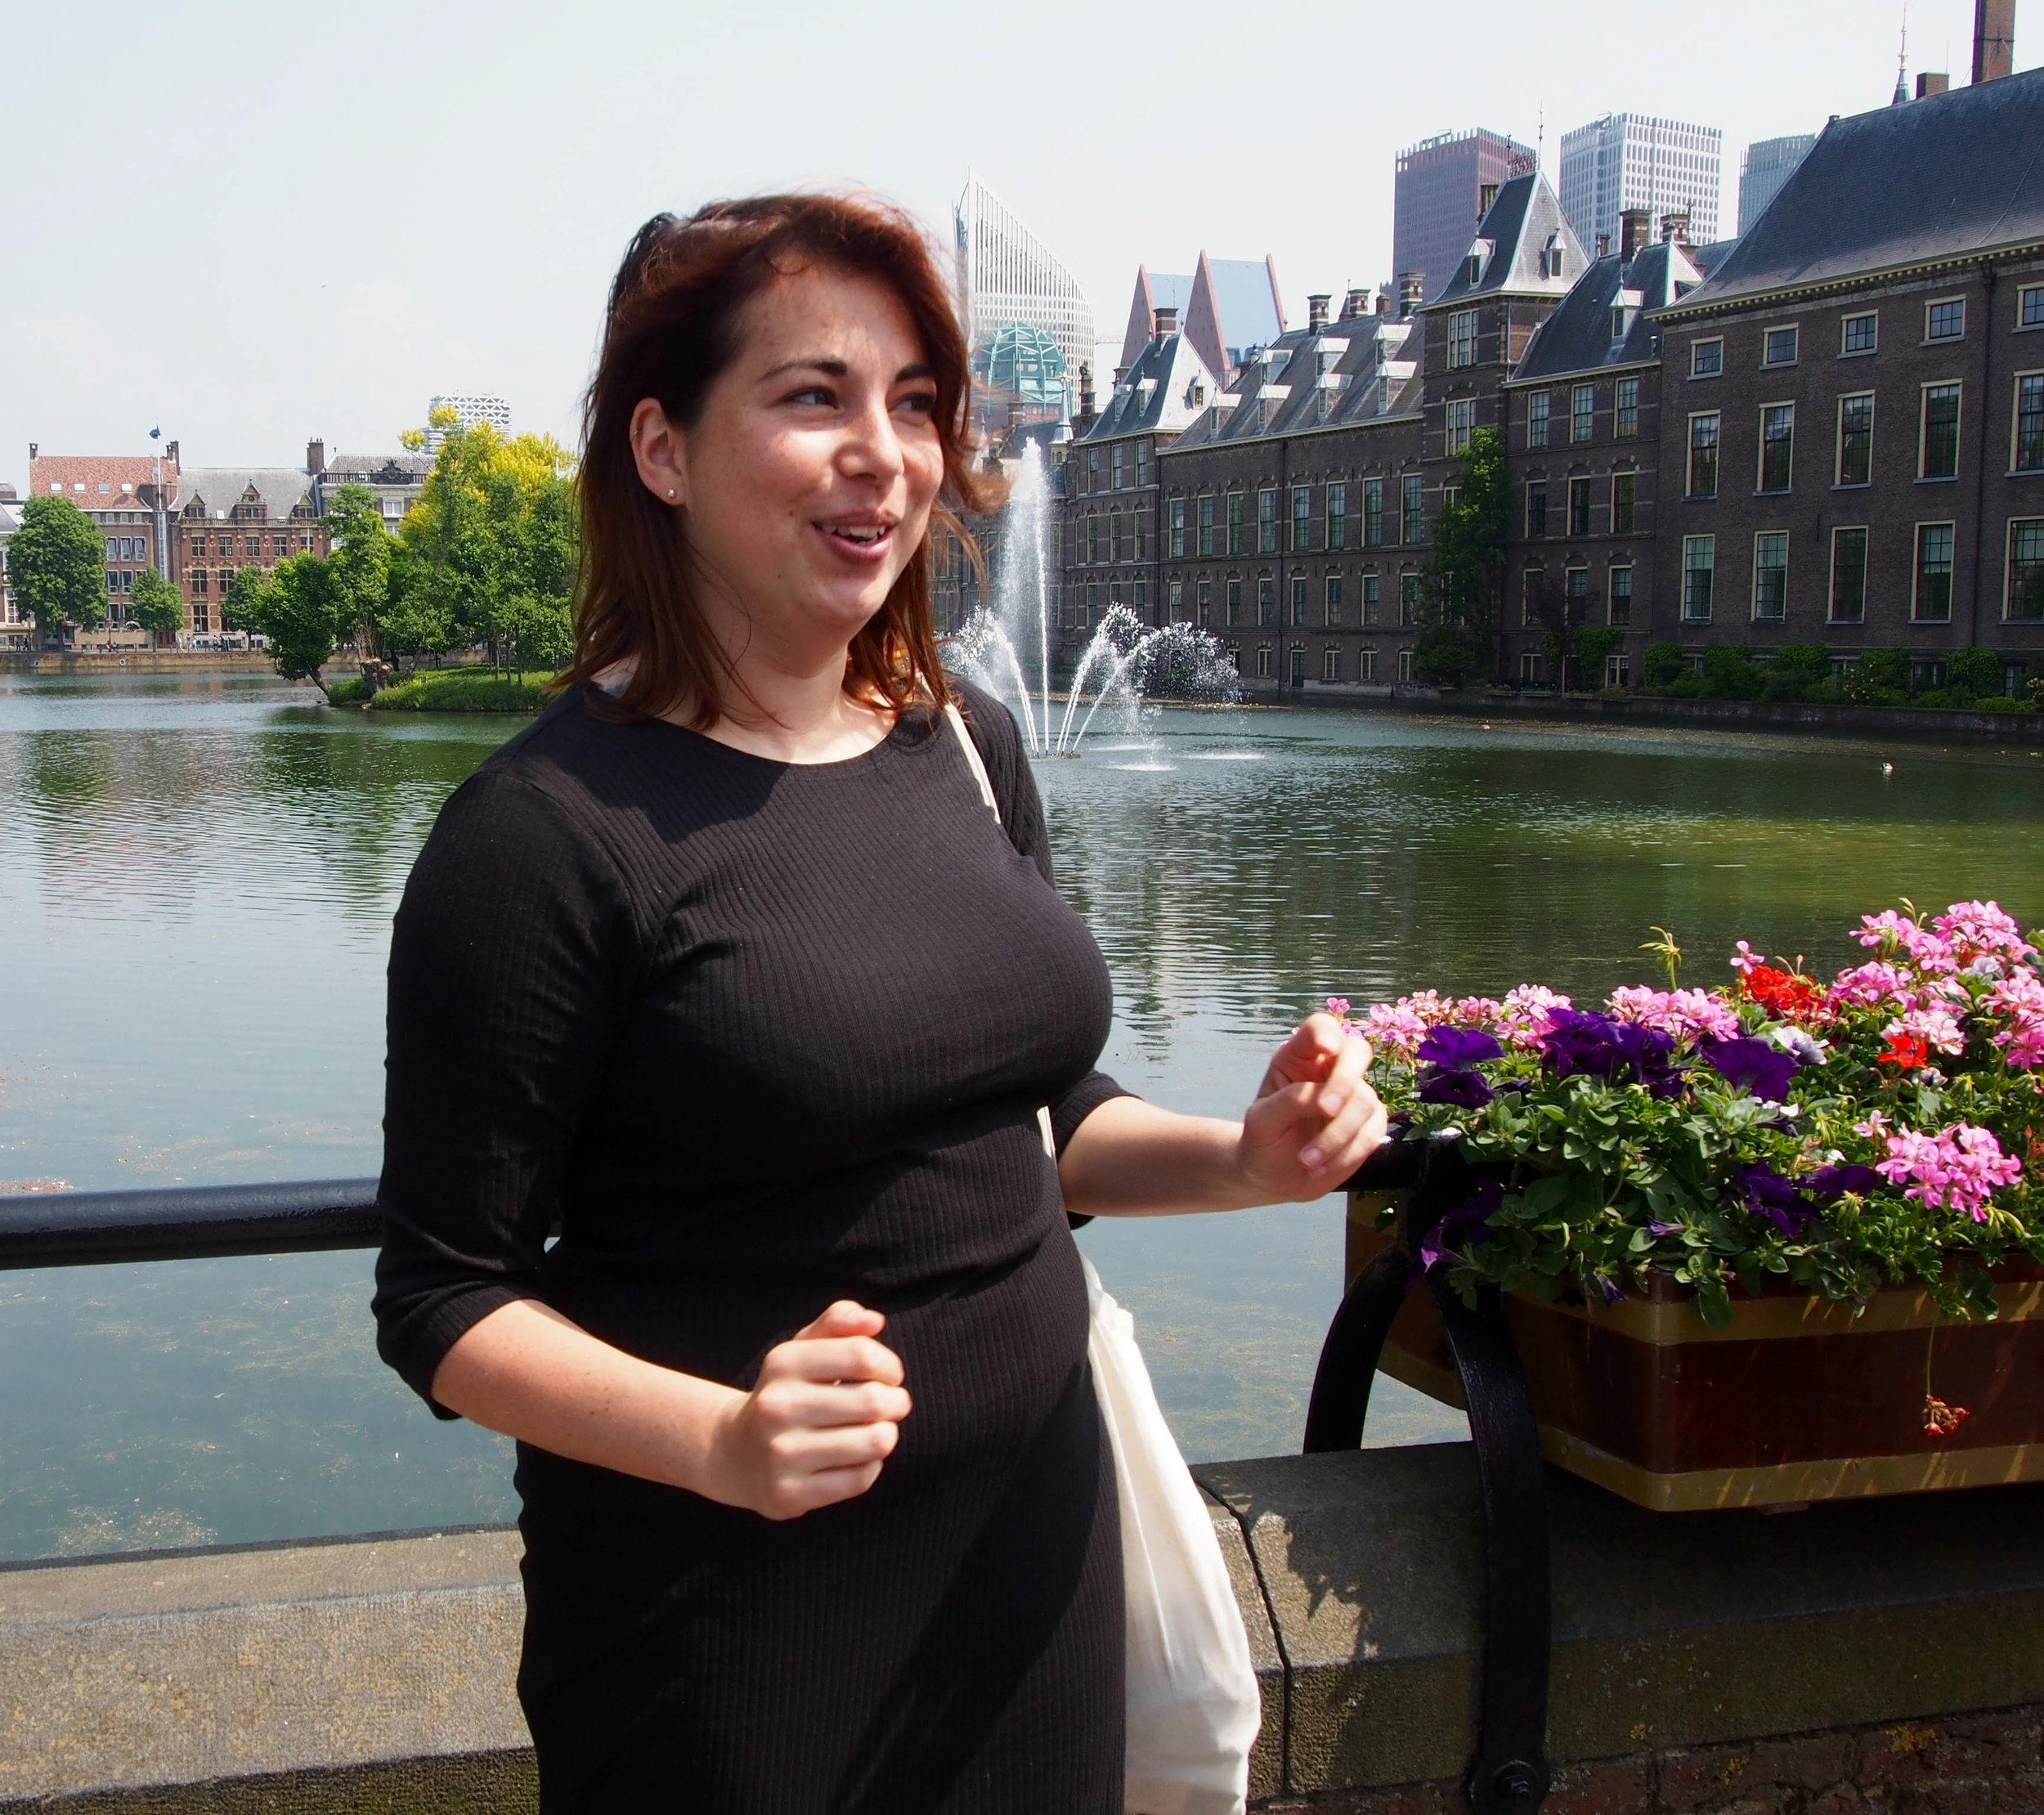 Kerensa enthousiast Binnenhof-5280114.jpg